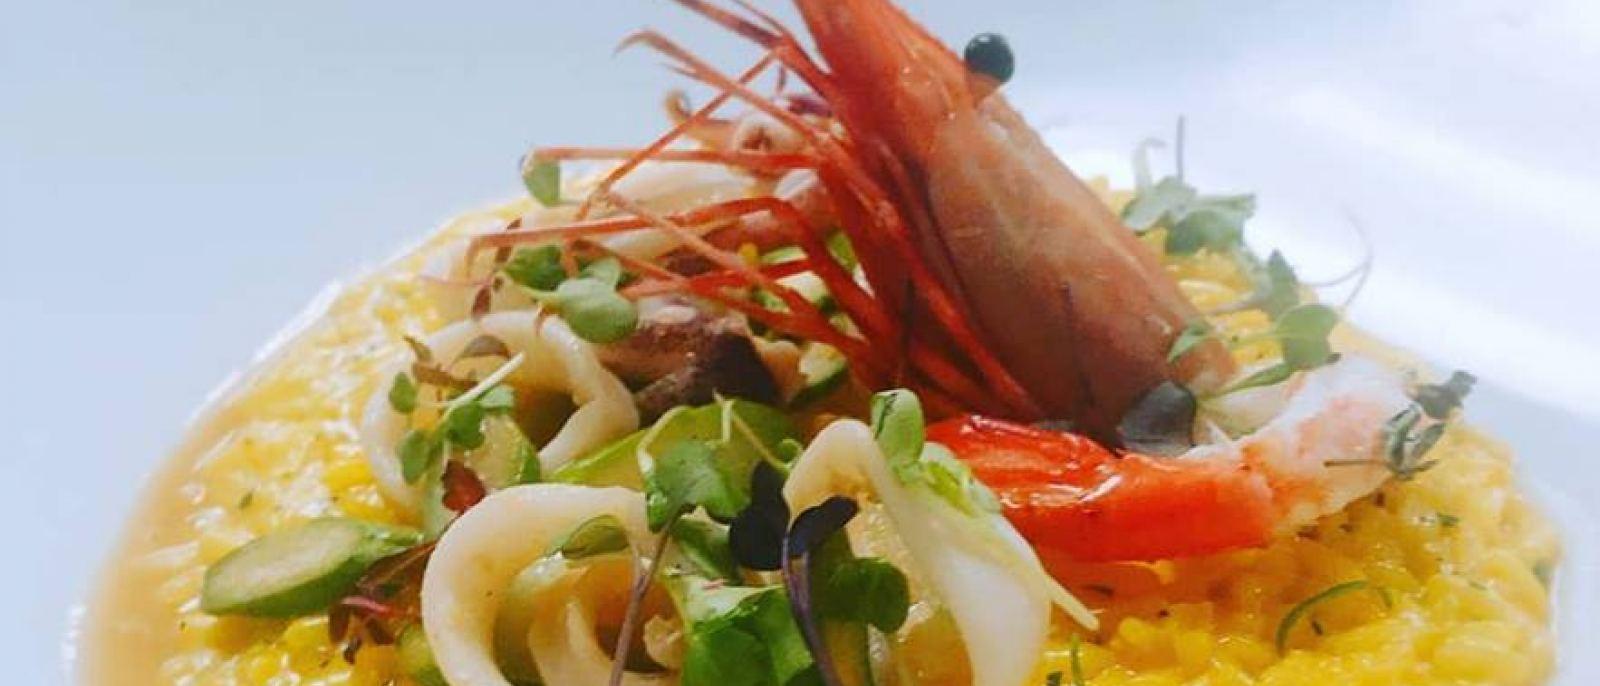 Saffron risotto with Santa Barbara prawns, calamari and asparagus at Drago Centro. Facebook